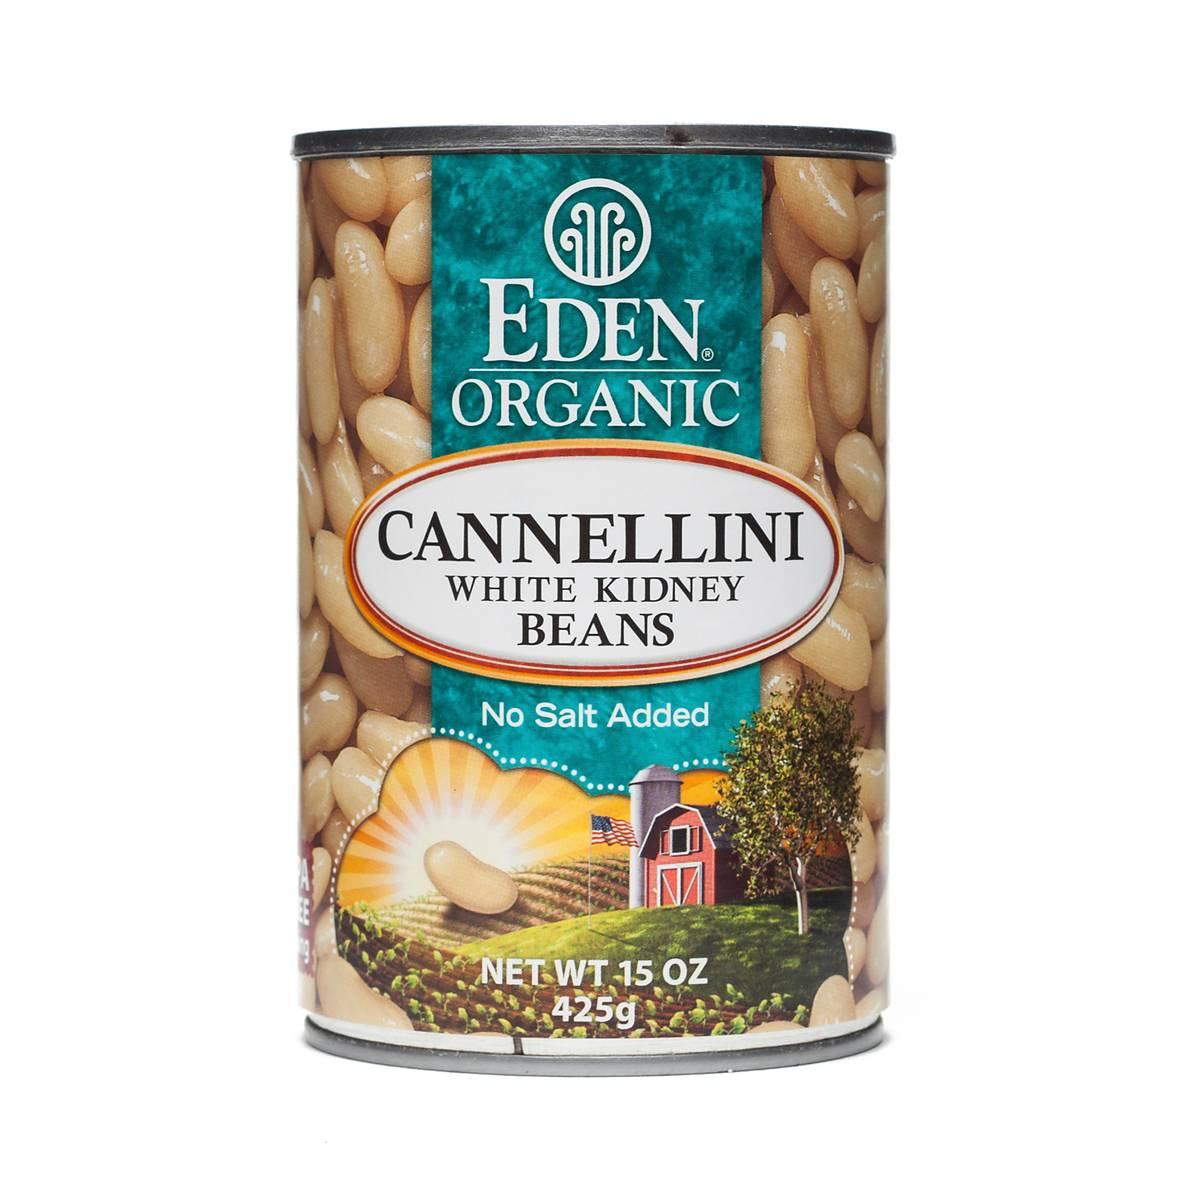 Organic cannellini beans